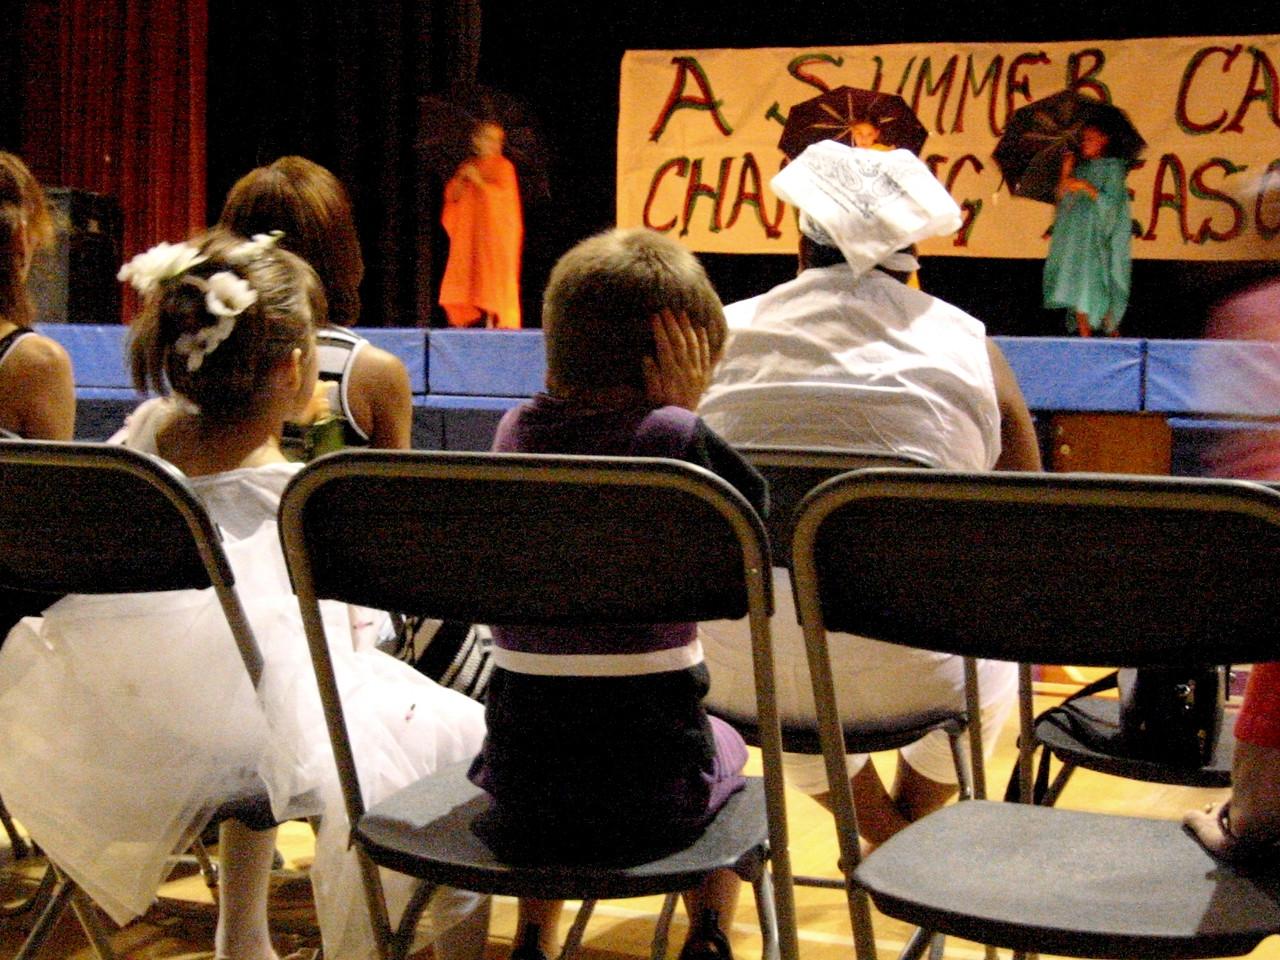 A Summer Cabaret at East Lake Park Community Center- August, 2002